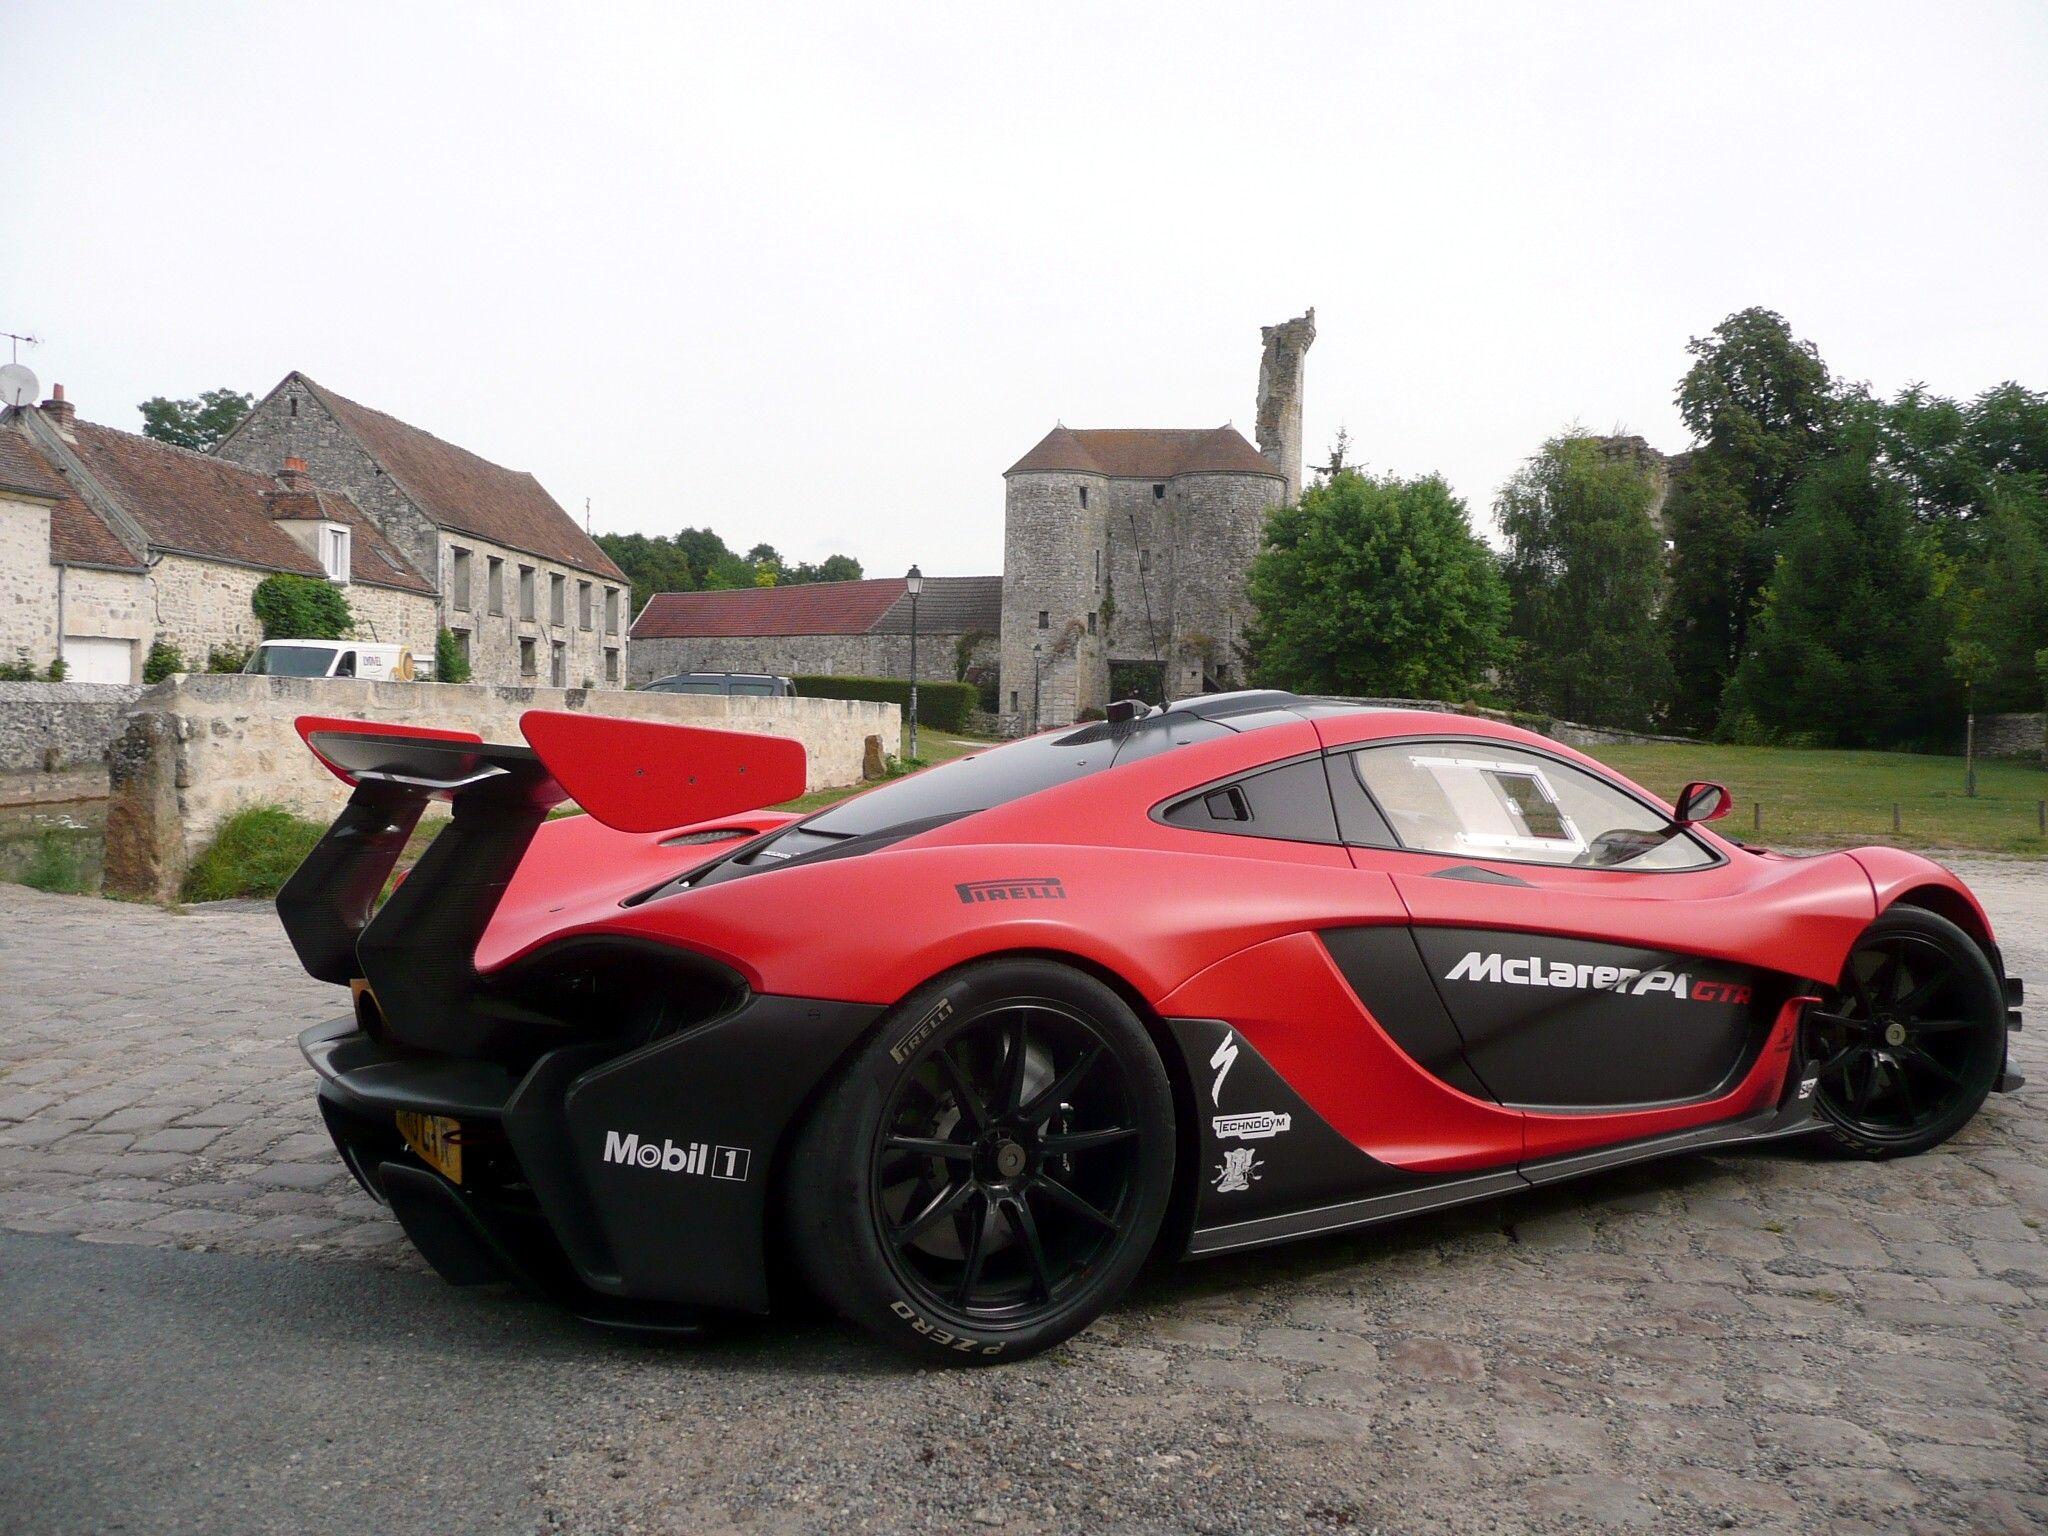 Mclaren P1 Gtr Mclaren Luxurycars Automotive Supercars Mclaren Fastest Cars In The World Cars Fast Cars Super Cars Car In The World